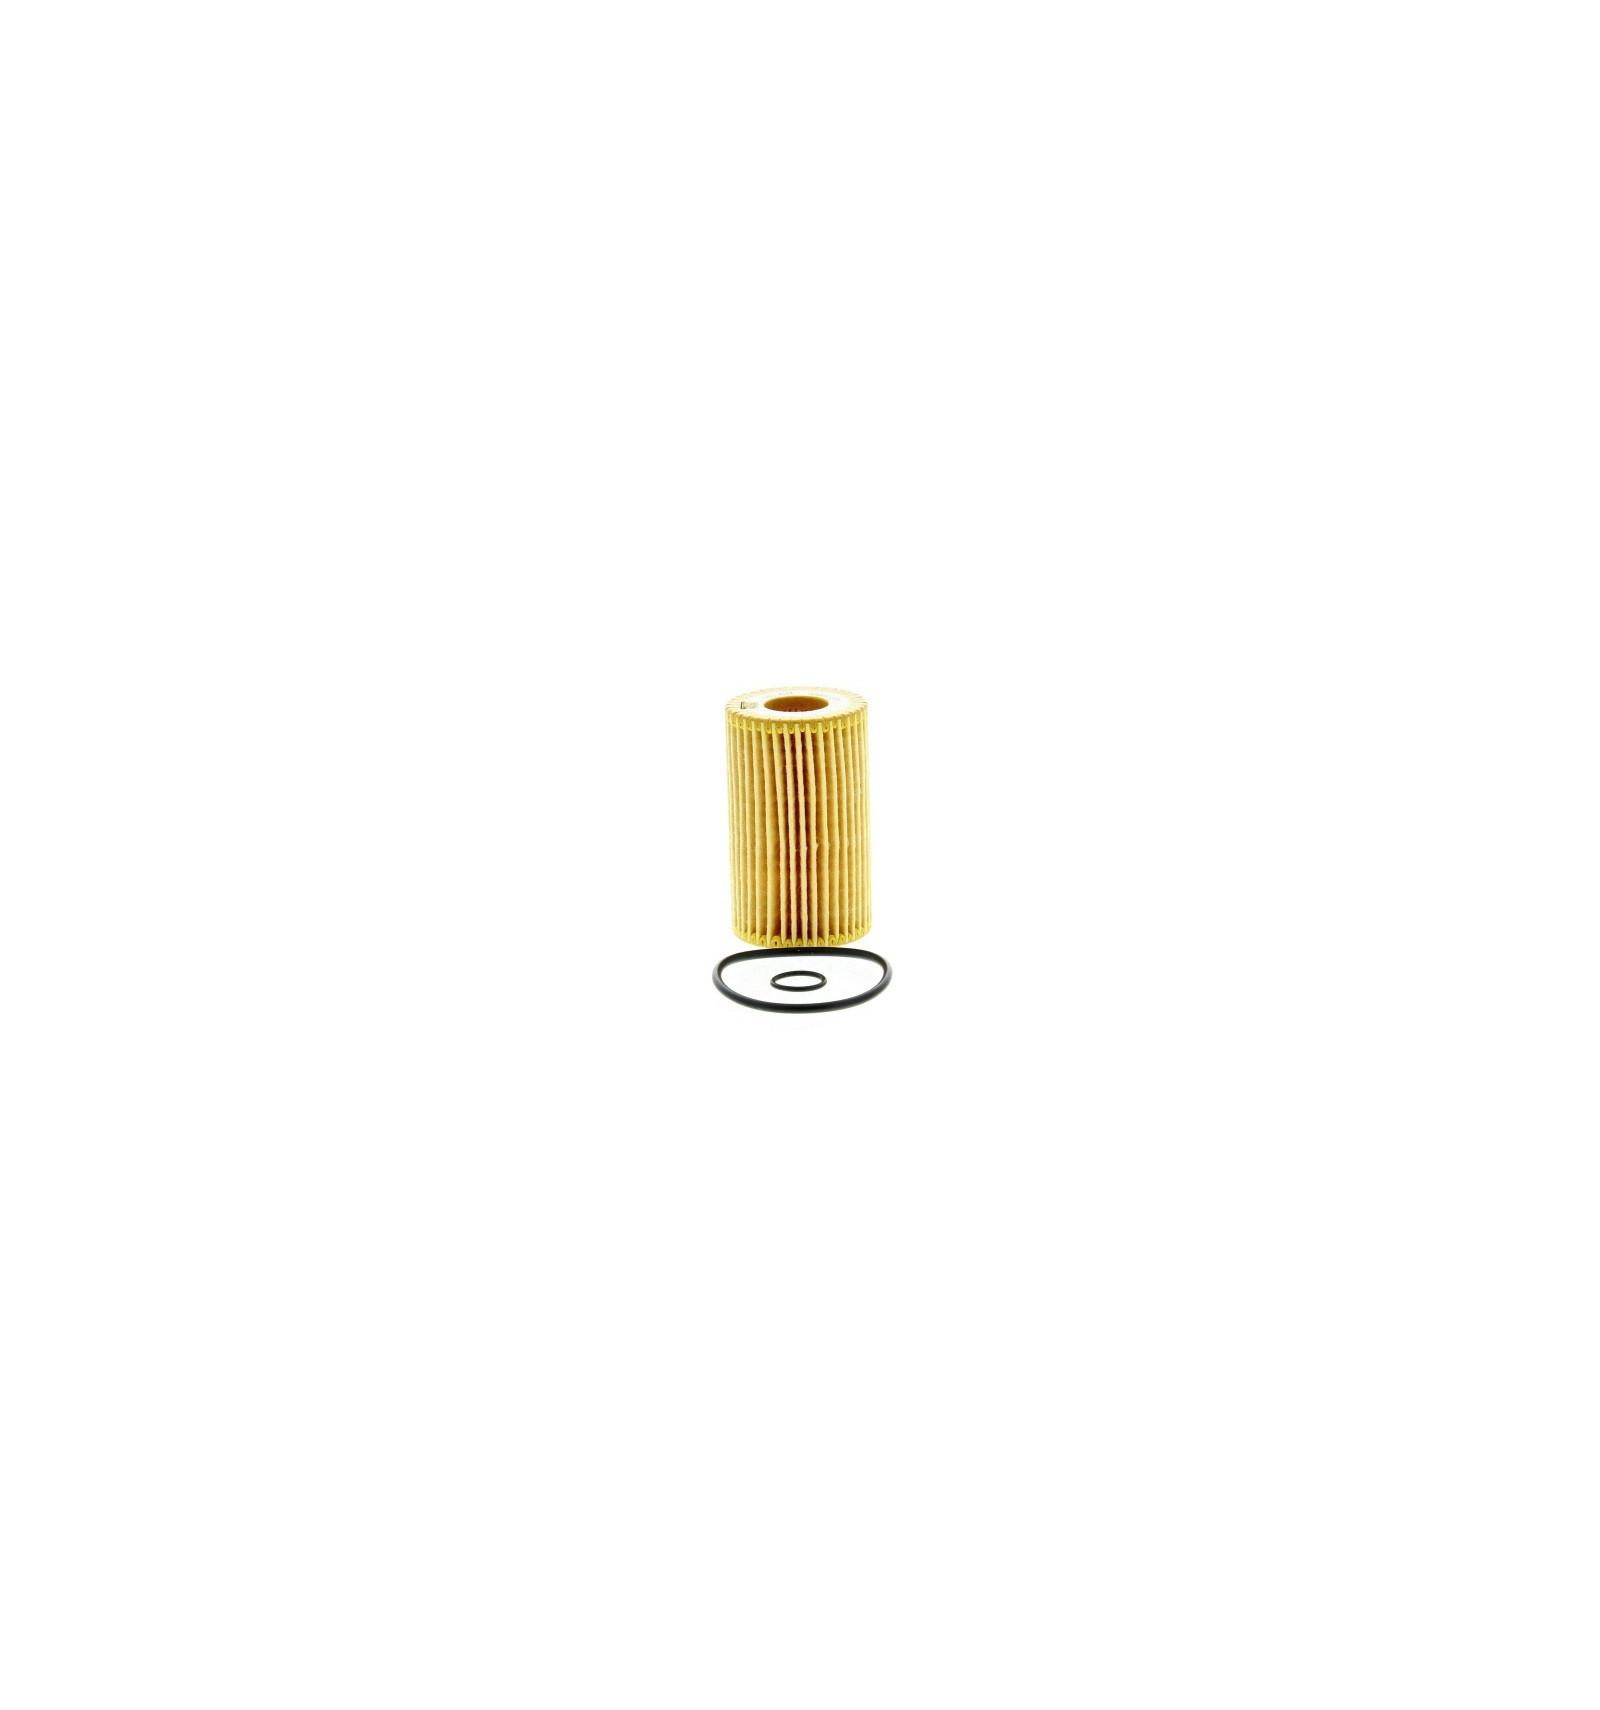 filtration filtre a huile renault clio ii kangoo twingo i 1 2 filtre a huile renault clio ii. Black Bedroom Furniture Sets. Home Design Ideas